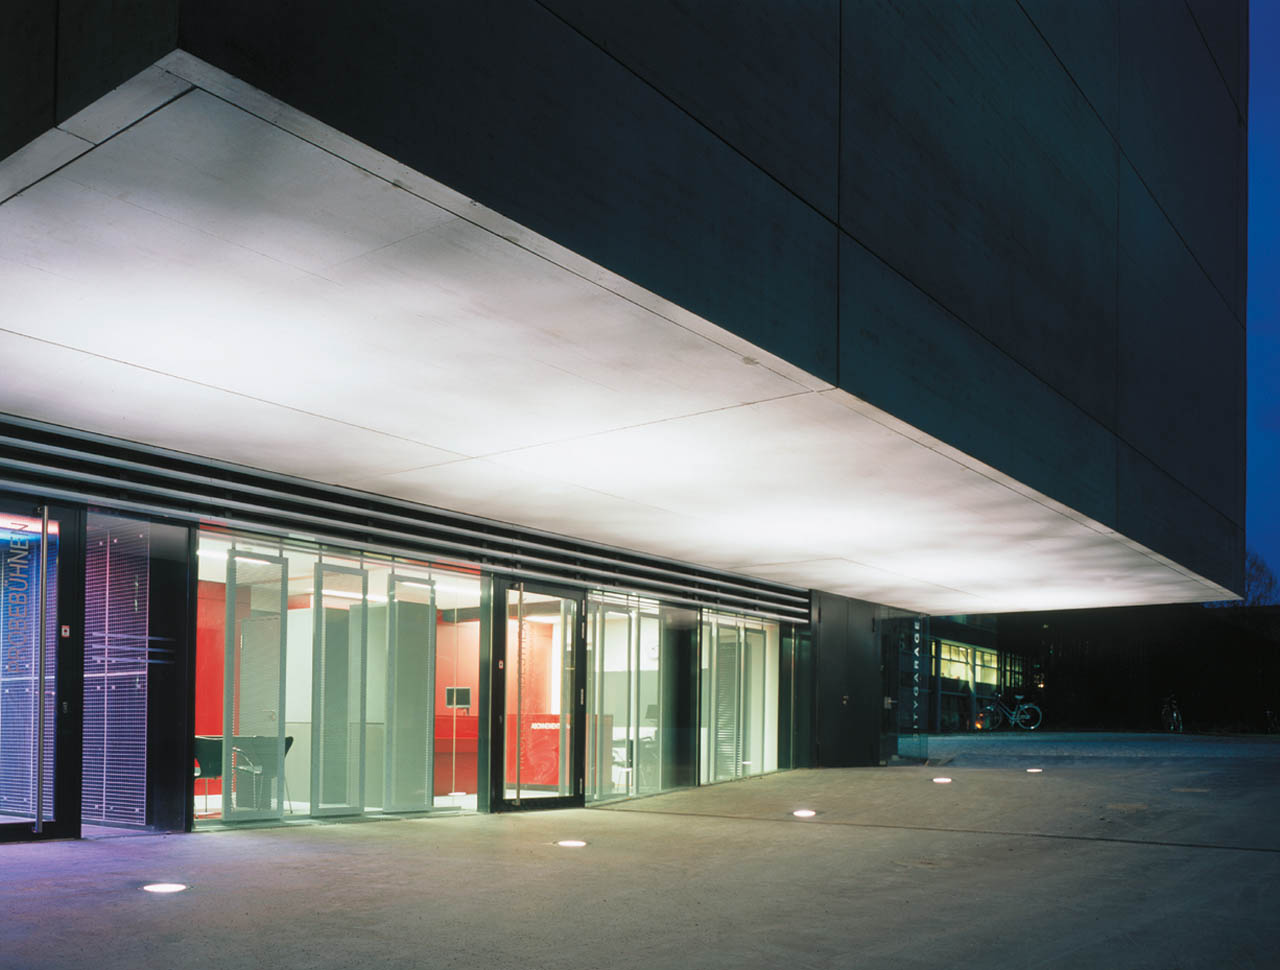 Tiroler Landestheater, Neubau Probengebäude, Innsbruck, Österreich